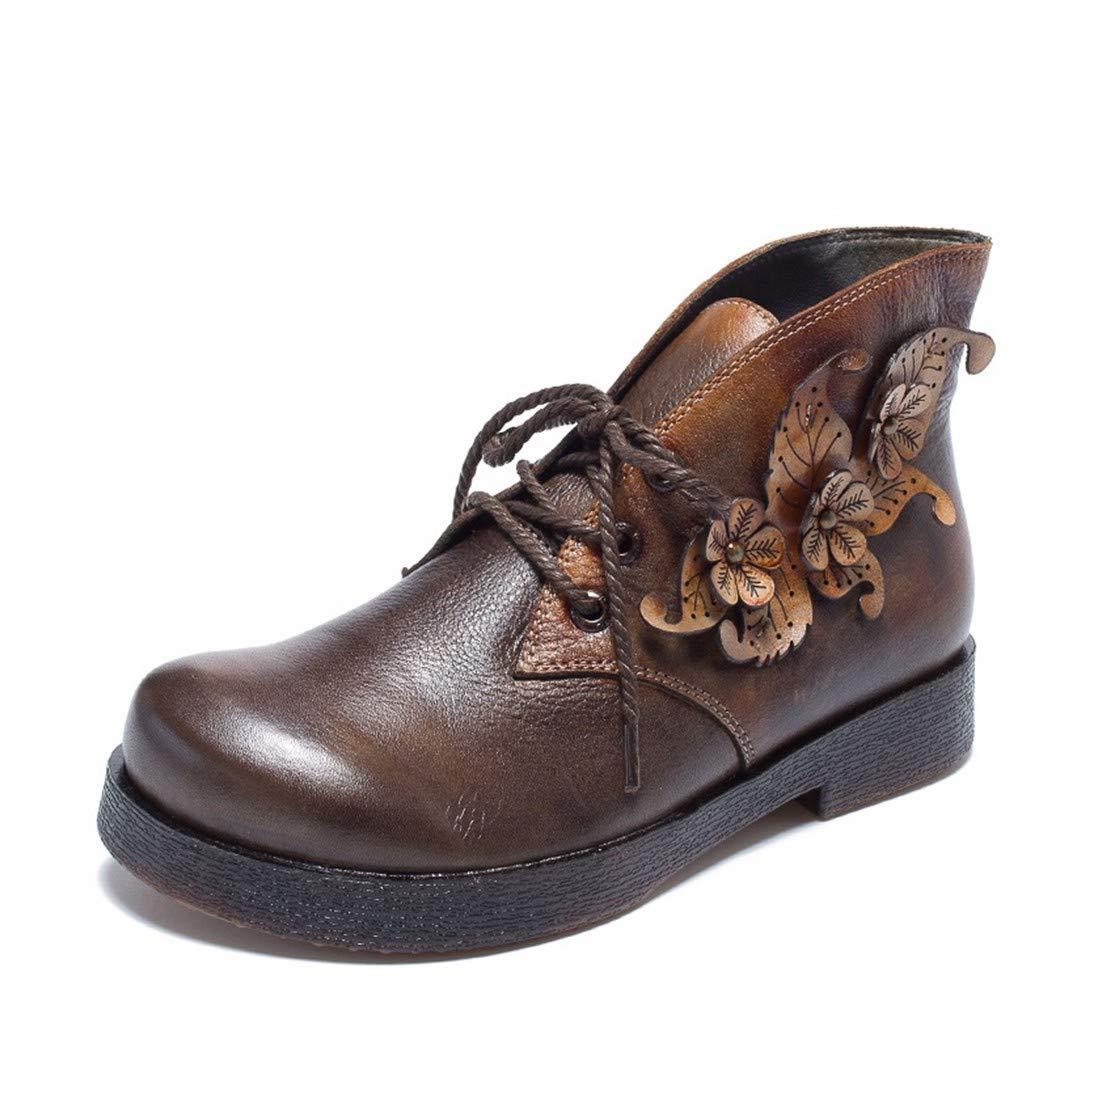 BeatinToes Retro Schuhe Leder Handarbeit Short Martin Stiefel Flachen Boden Wasserdicht Plattform Frauen Schuhe